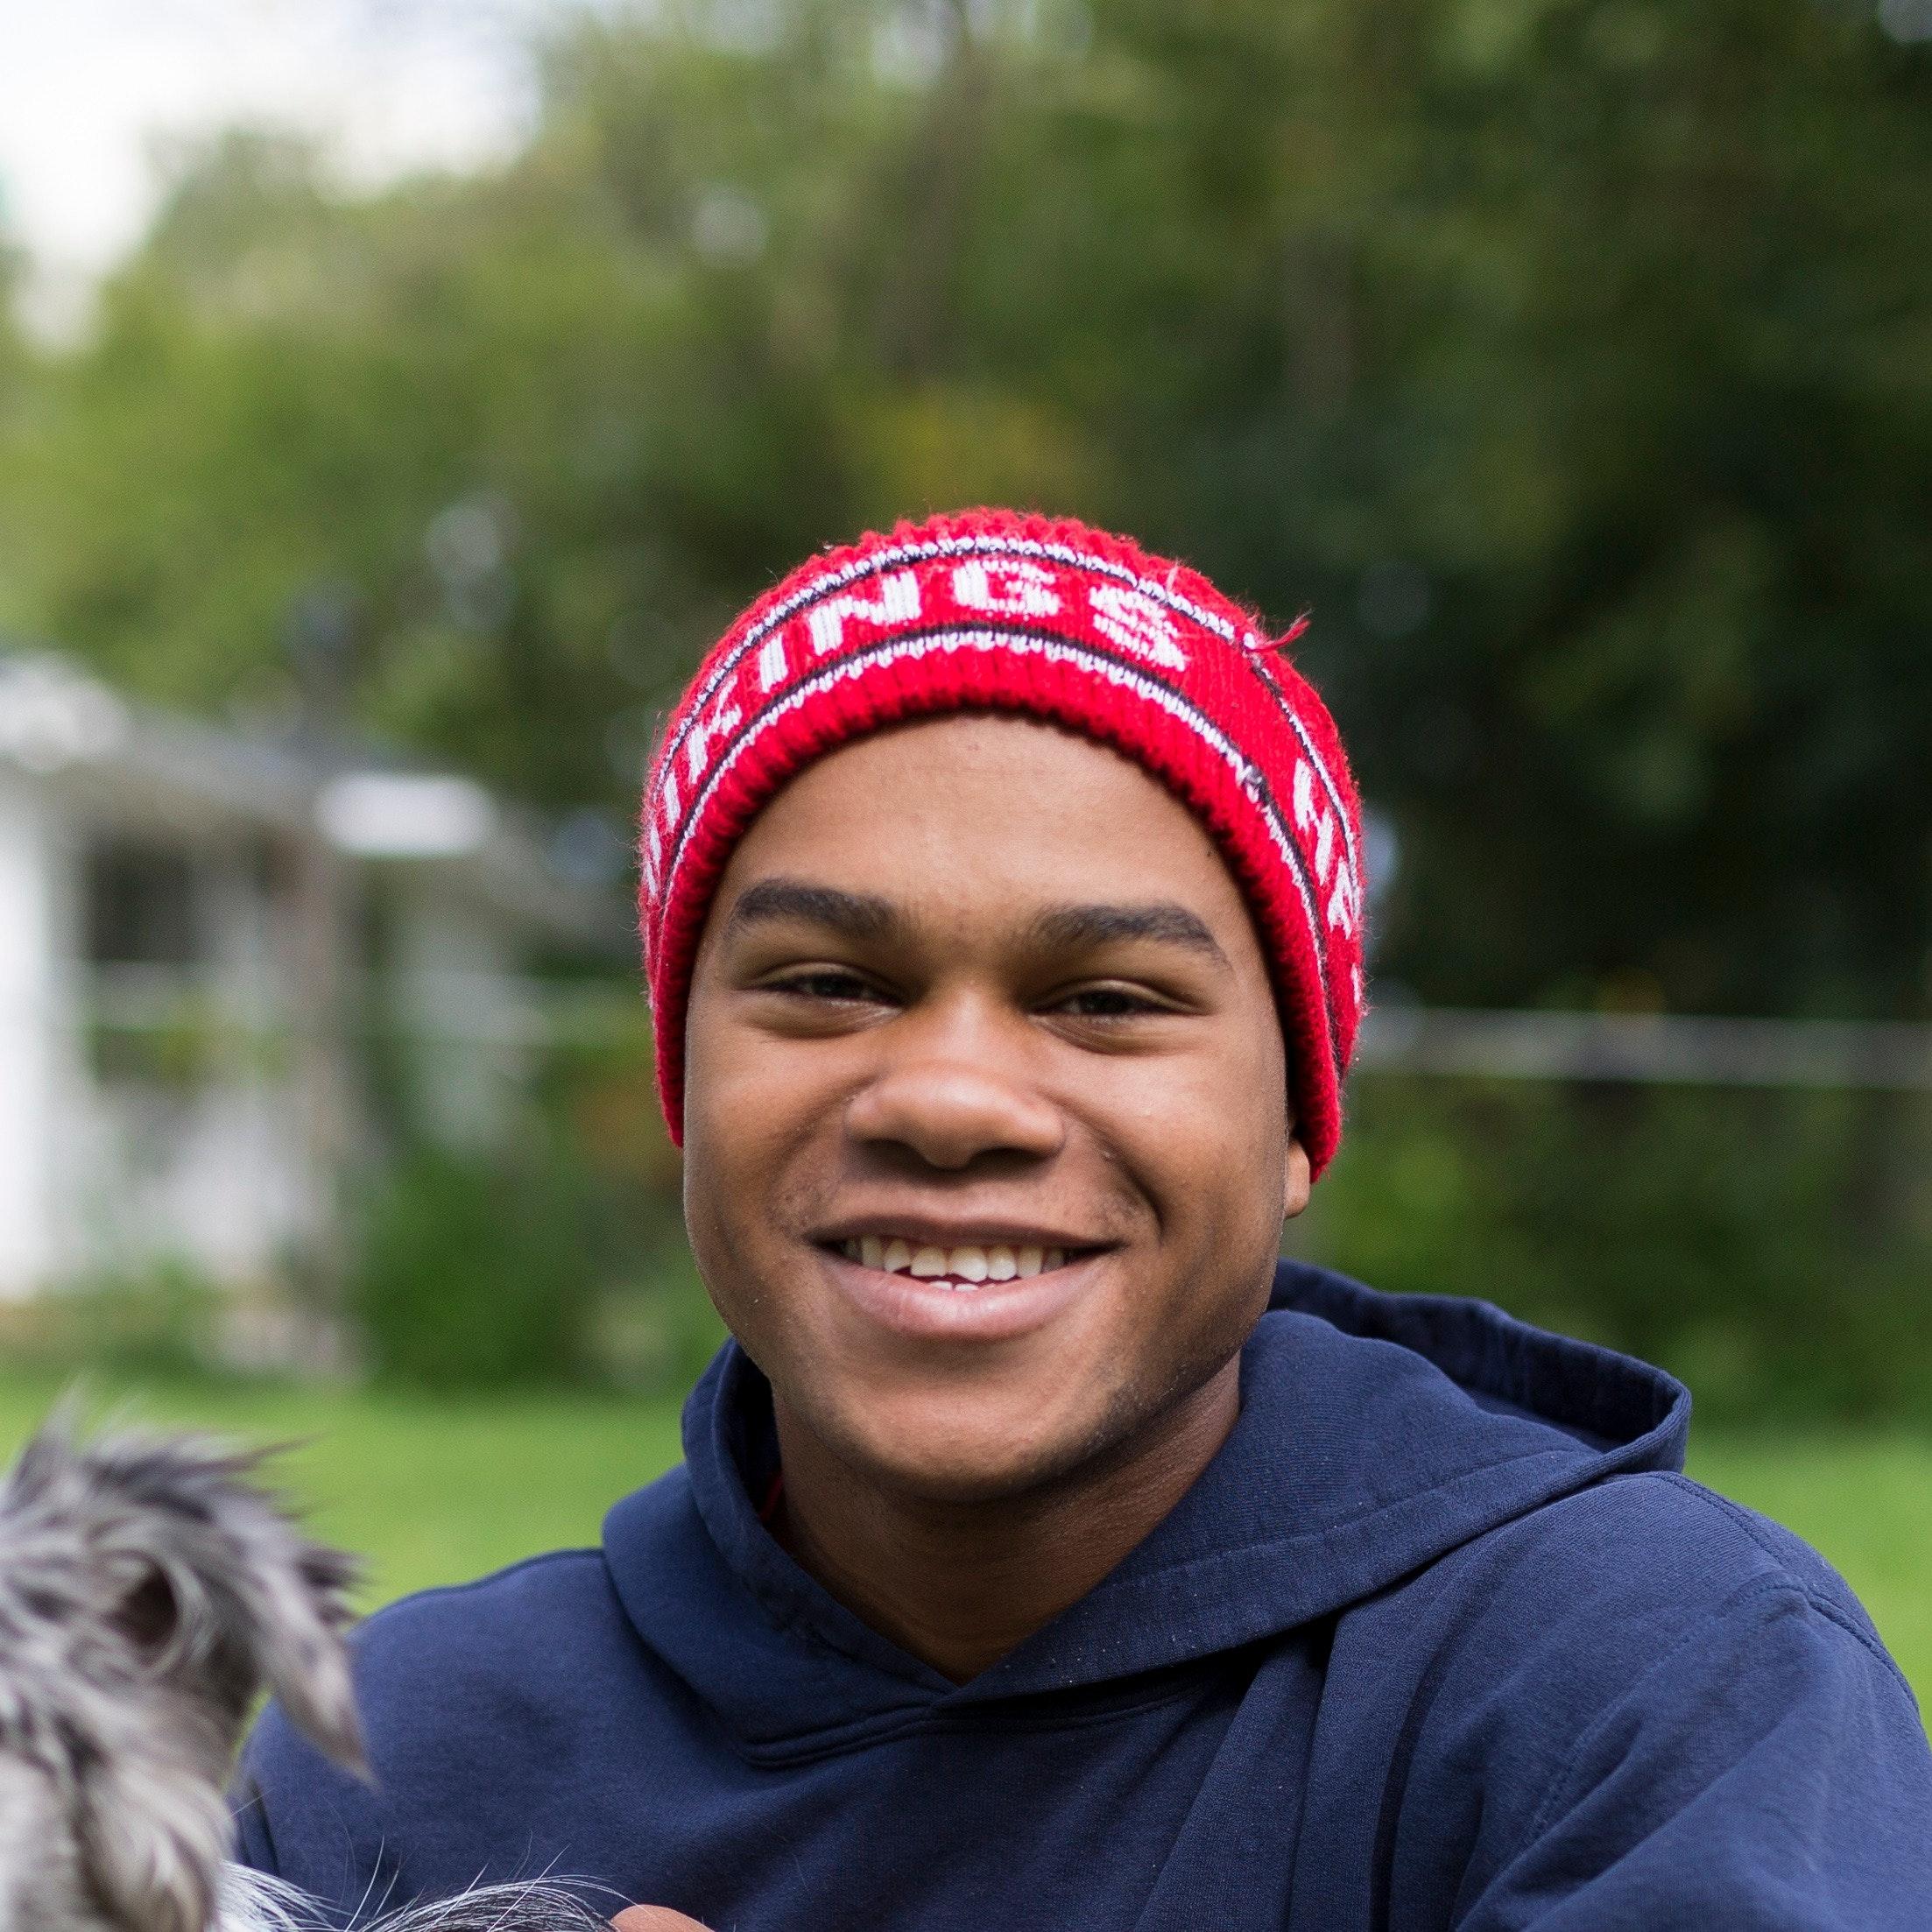 Joshua's dog day care